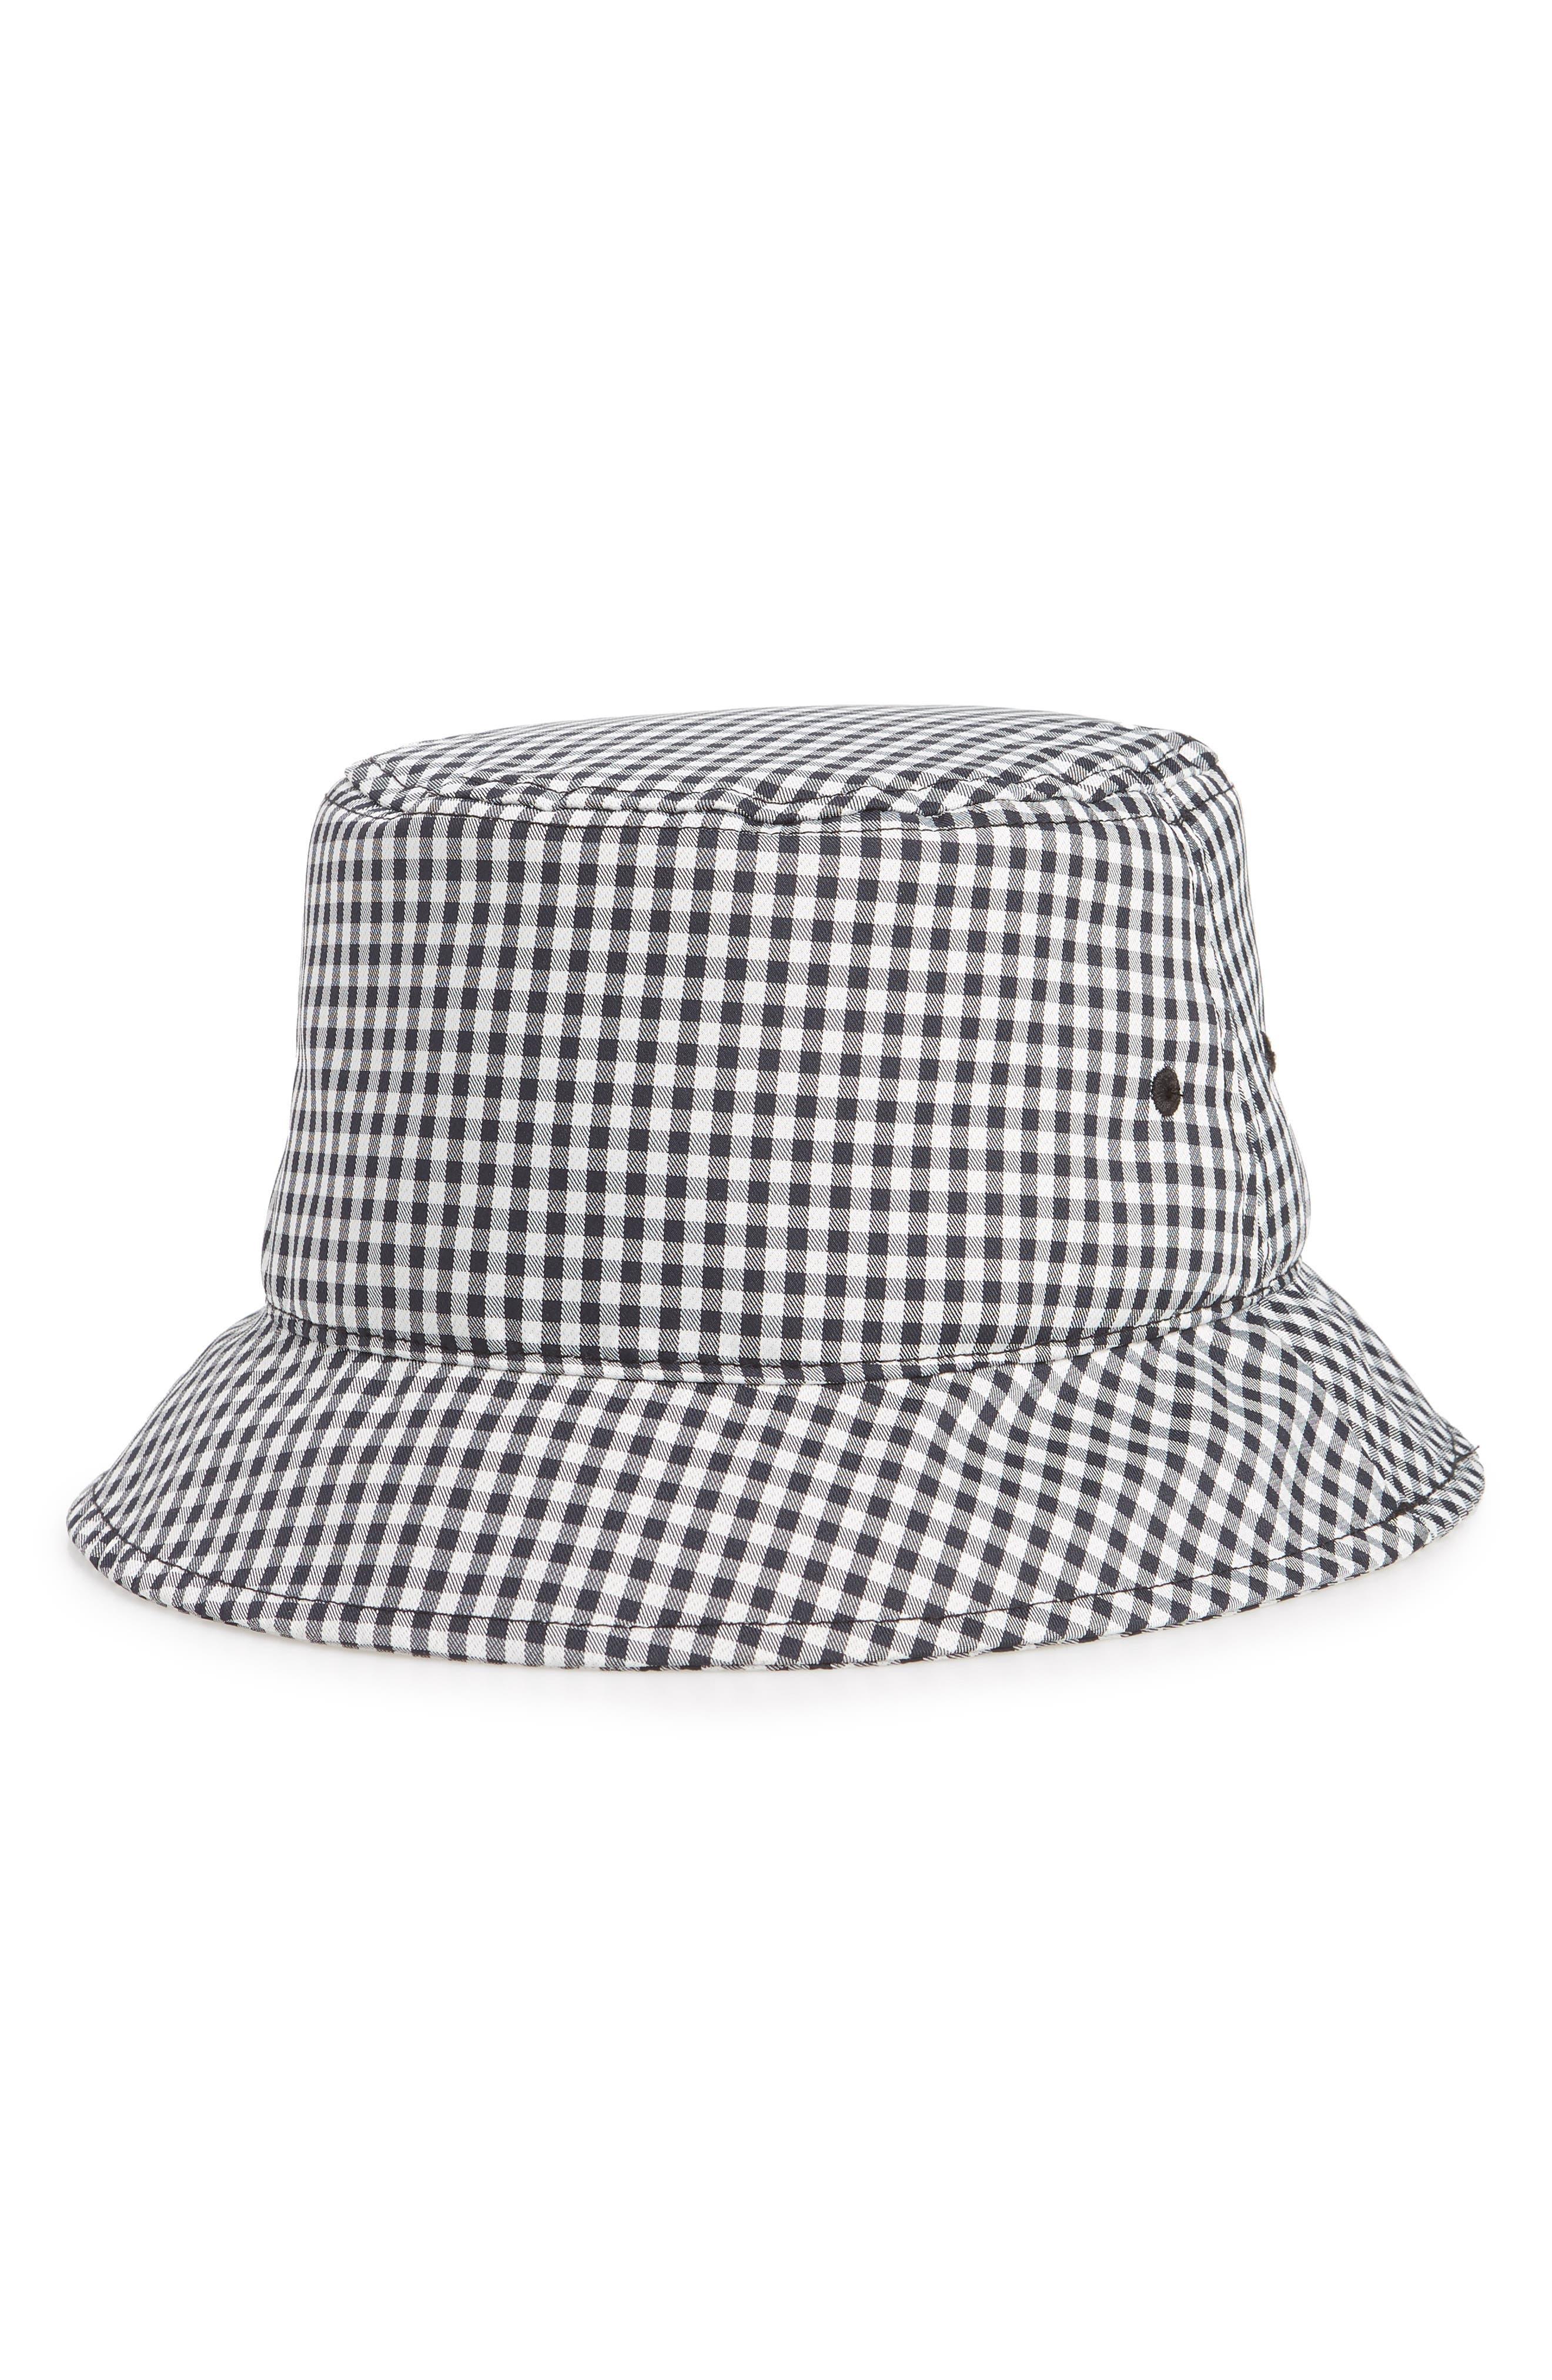 Ellis Bucket Hat,                         Main,                         color, NAVY GINGHAM